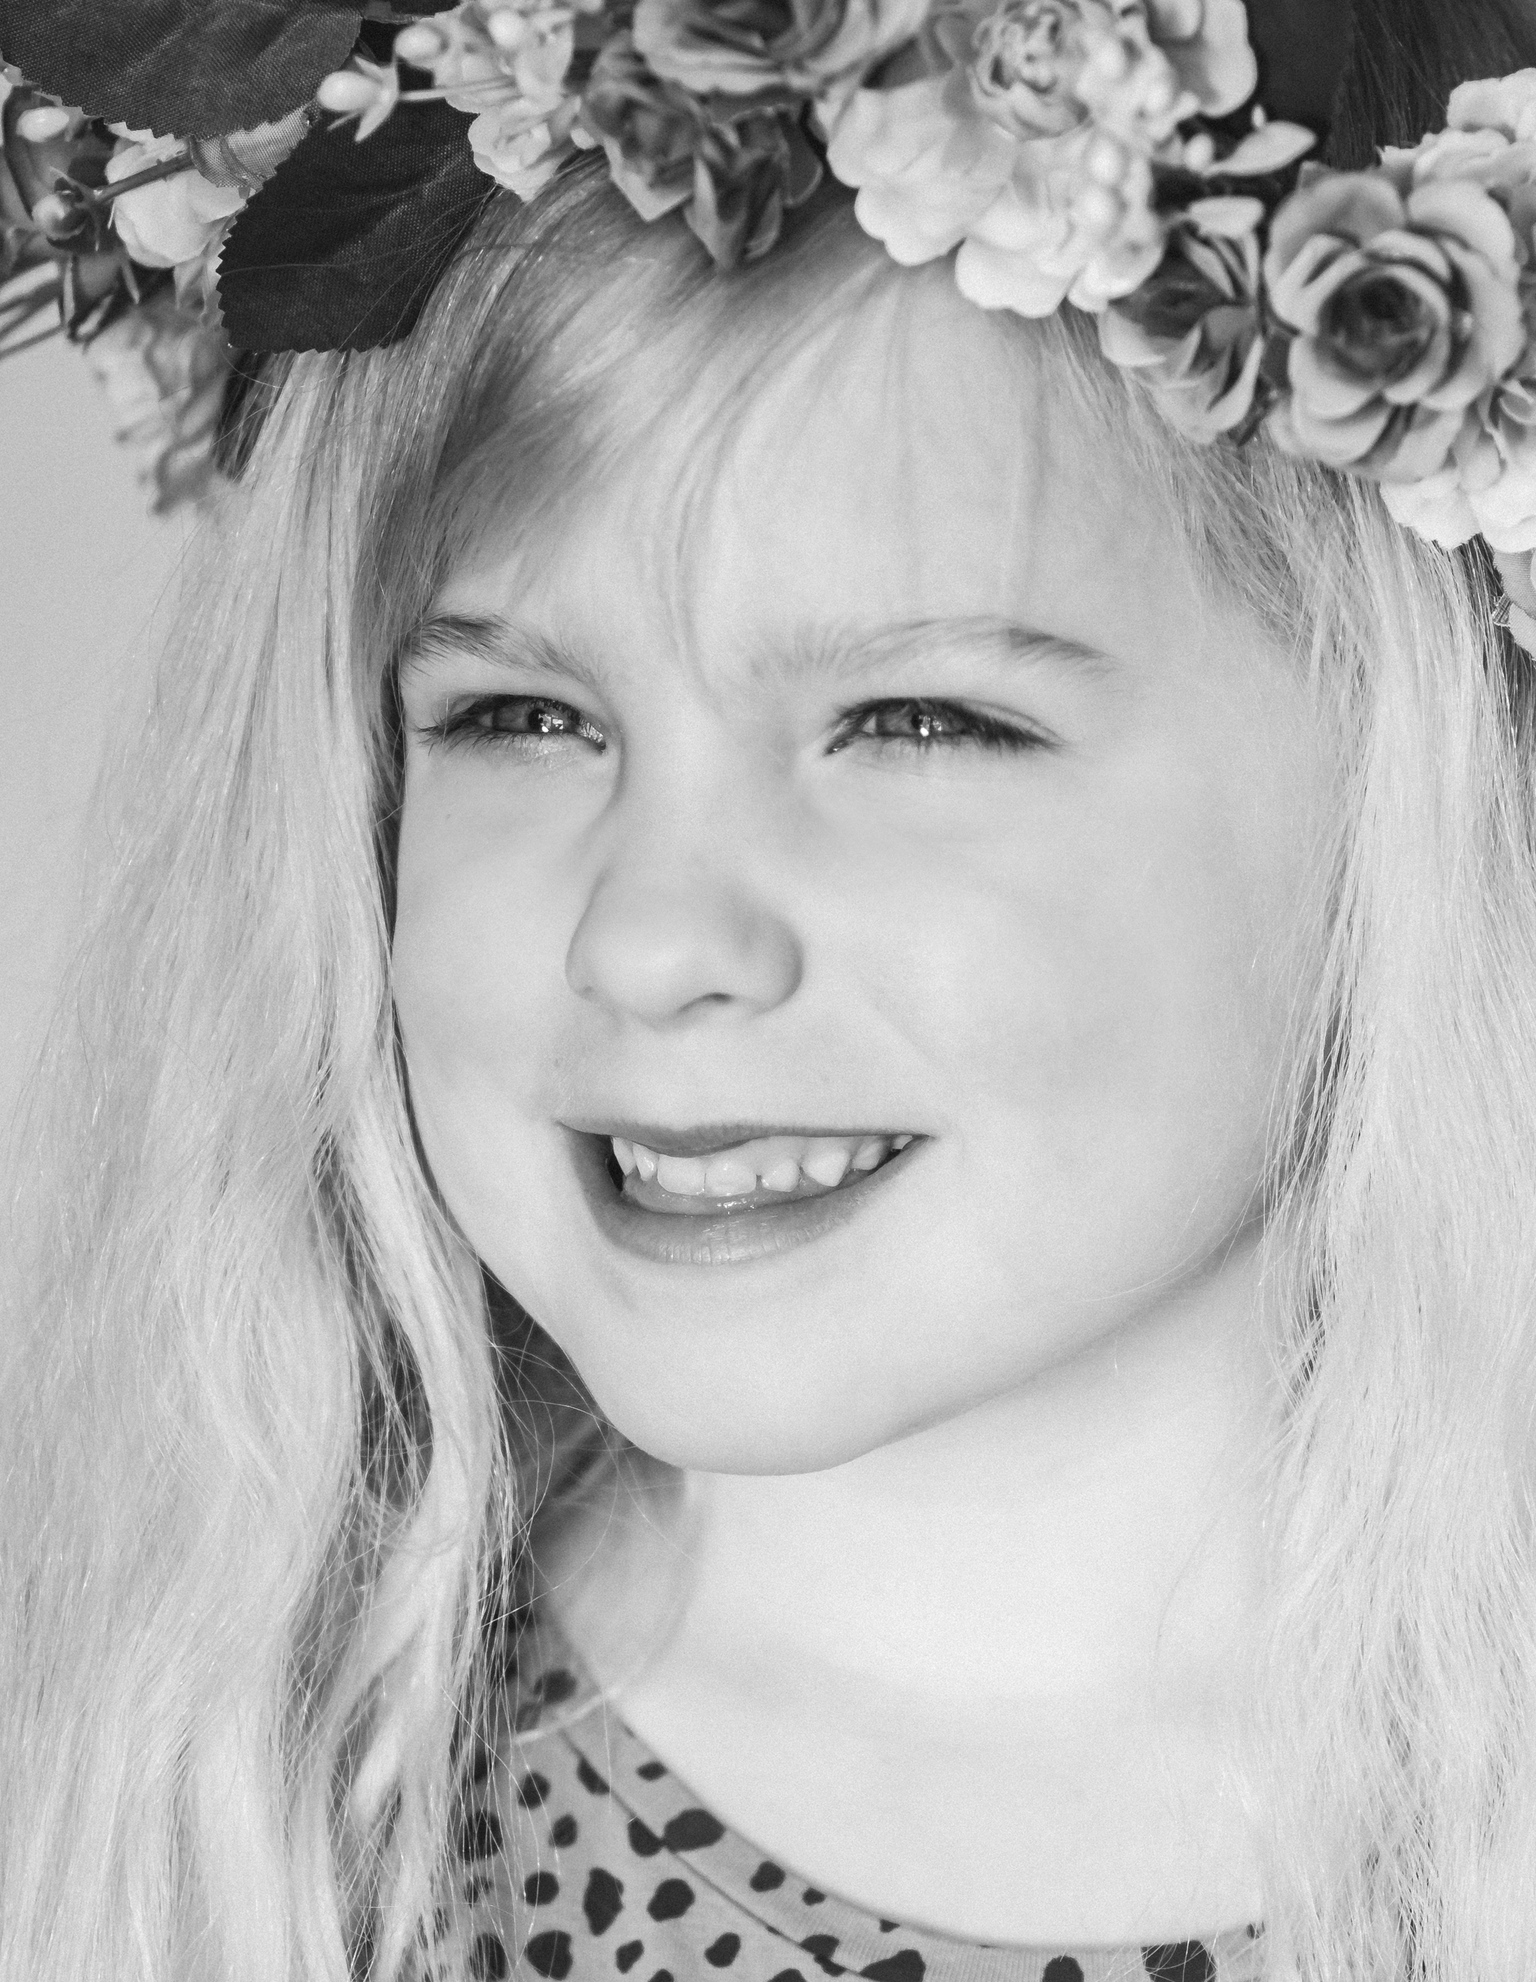 F E N N E - Daglicht portretten - foto door SerenaZoom op 13-04-2021 - deze foto bevat: portret, daglicht, meisje, lief, bloemen, fotoshoot, zwartwit, d7500, nikon, licht, haar, gezicht, glimlach, hoofd, lip, wenkbrauw, kapsel, oog, fotograaf, wimper